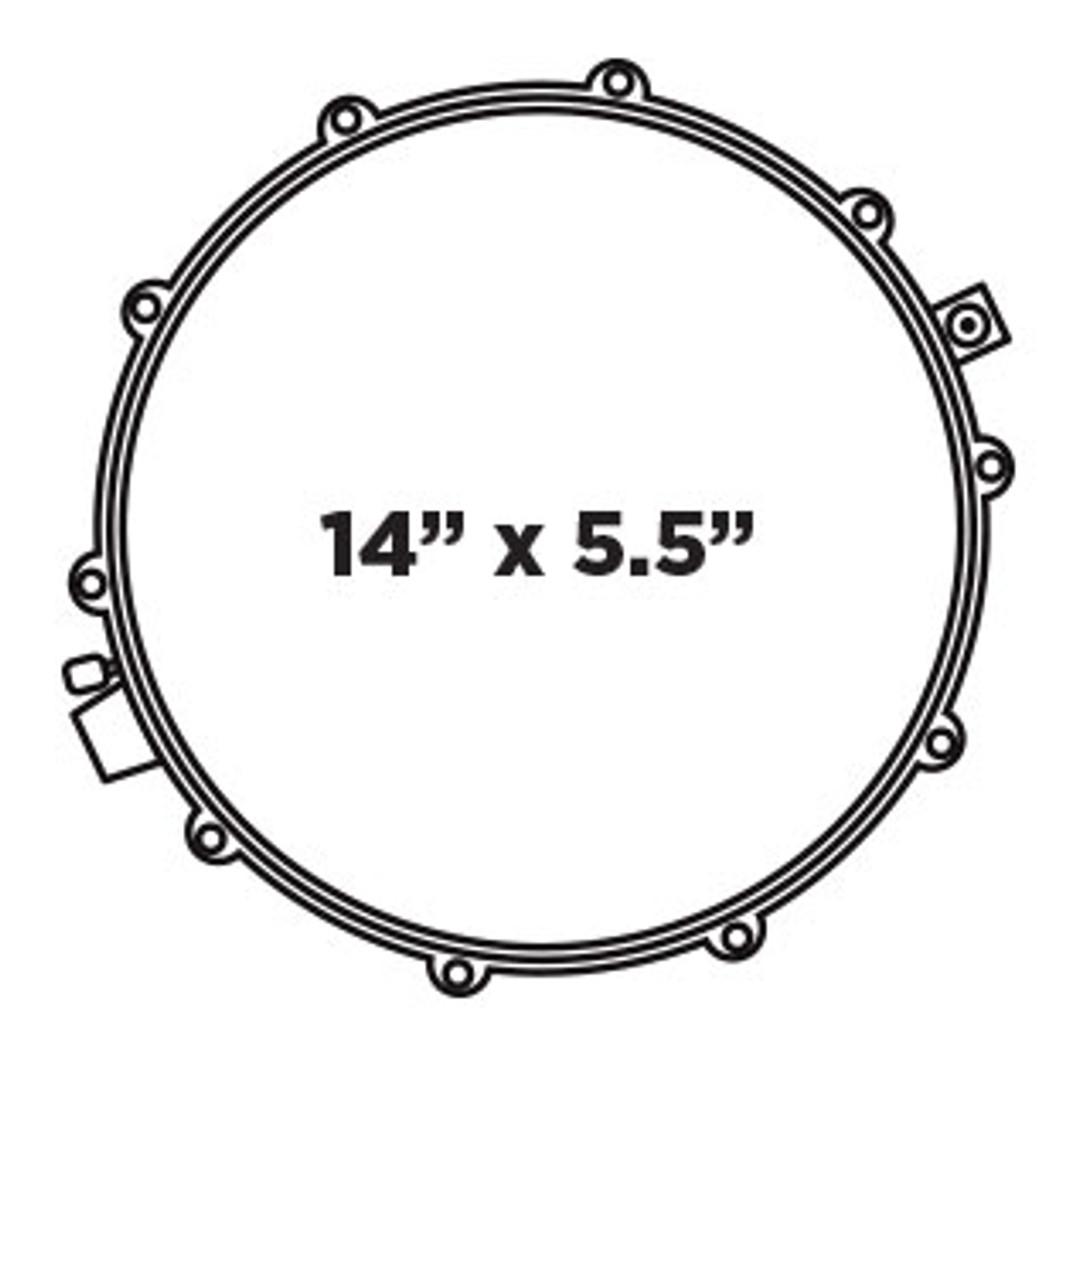 Mapex Black Panther Velvetone Snare Drum 14 x 5.5